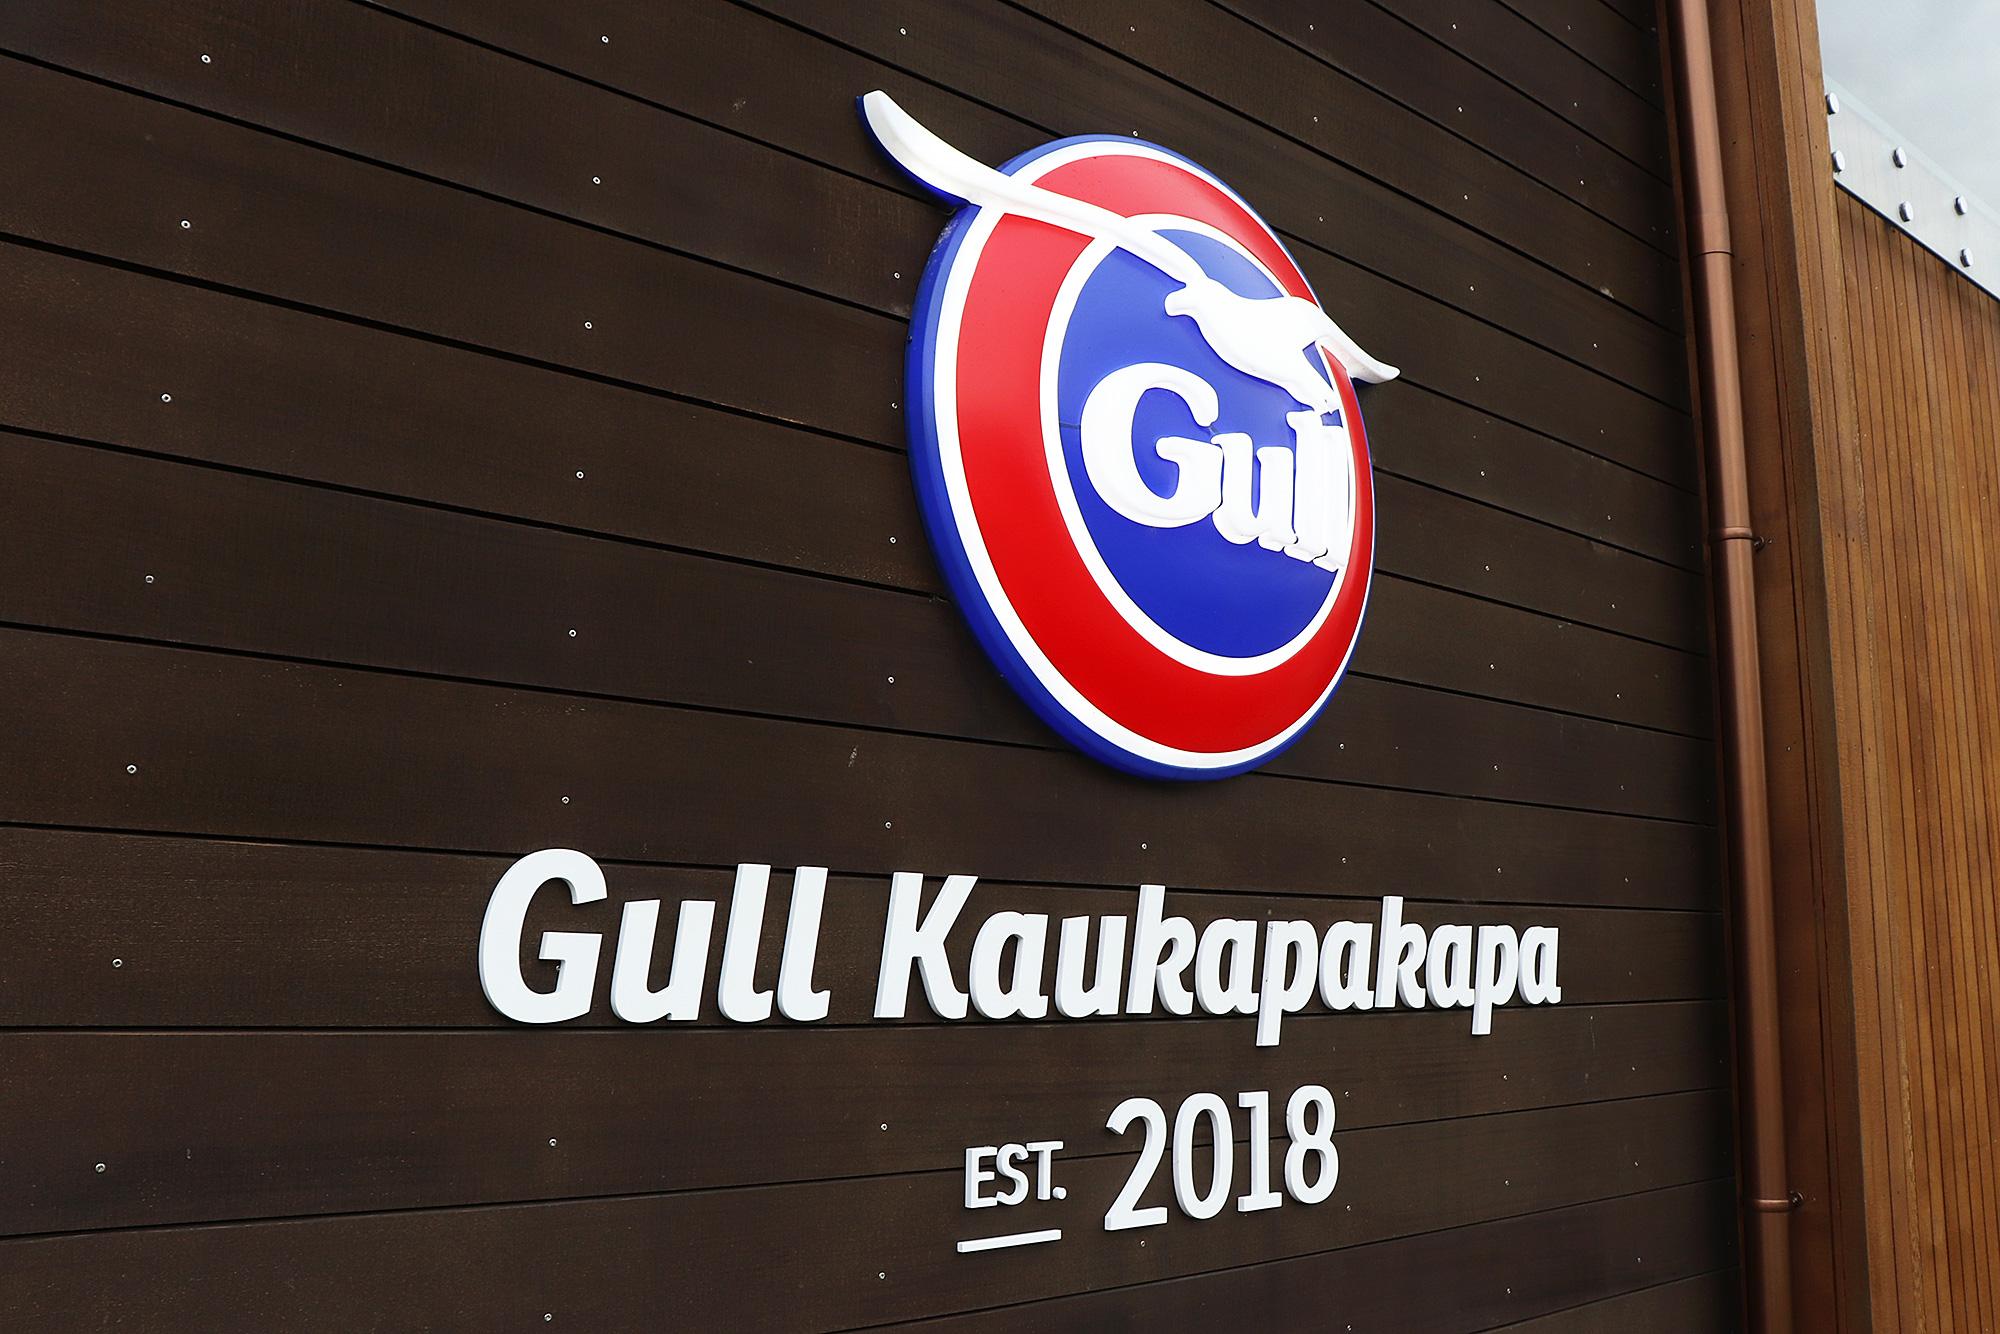 3D lettering on the Gull shop at Kaukapakapa